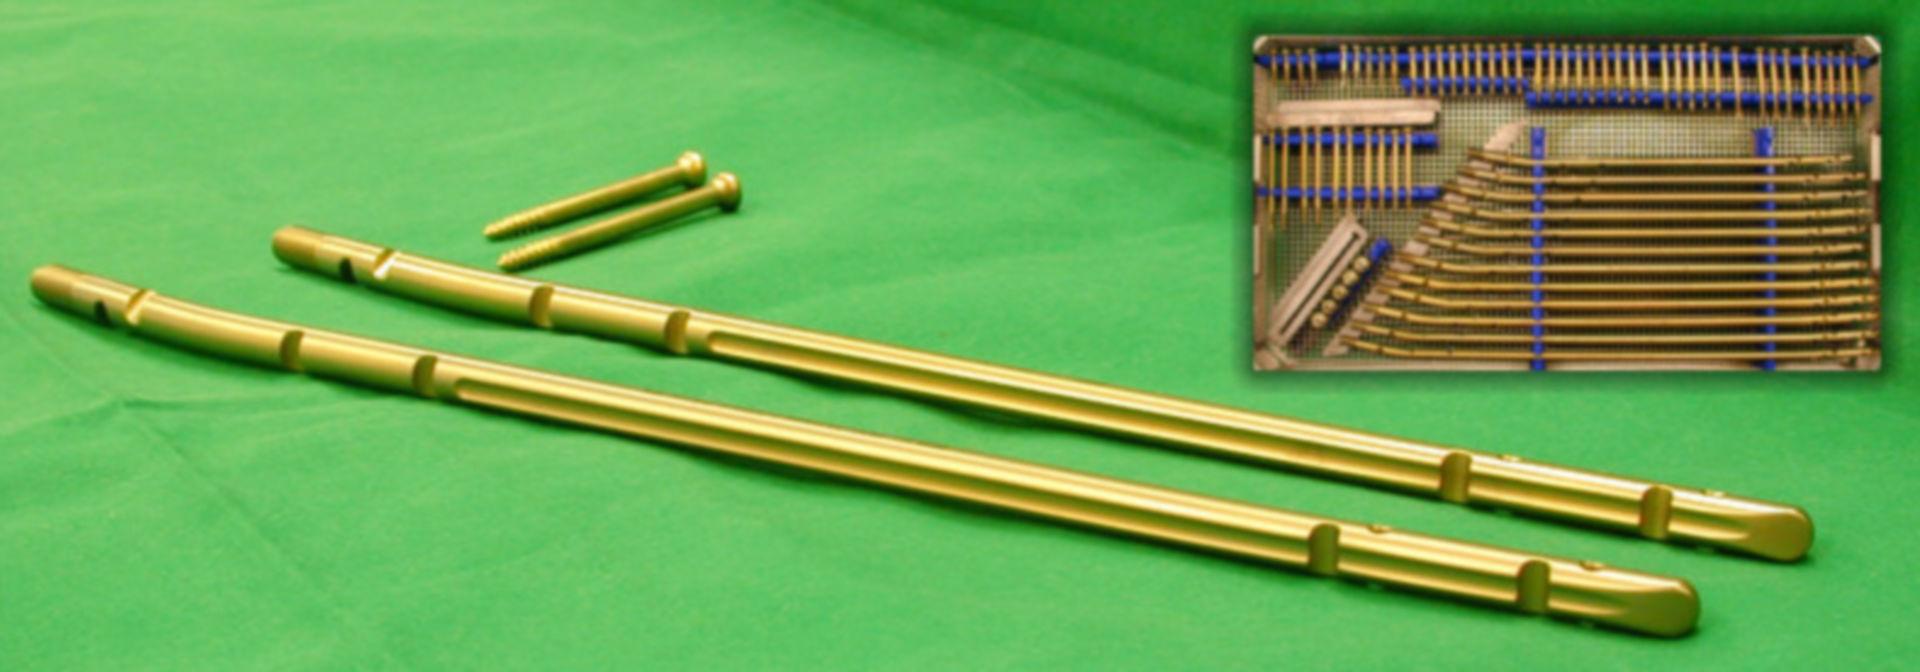 Tibia Nails and Interlocking Nails, Titan